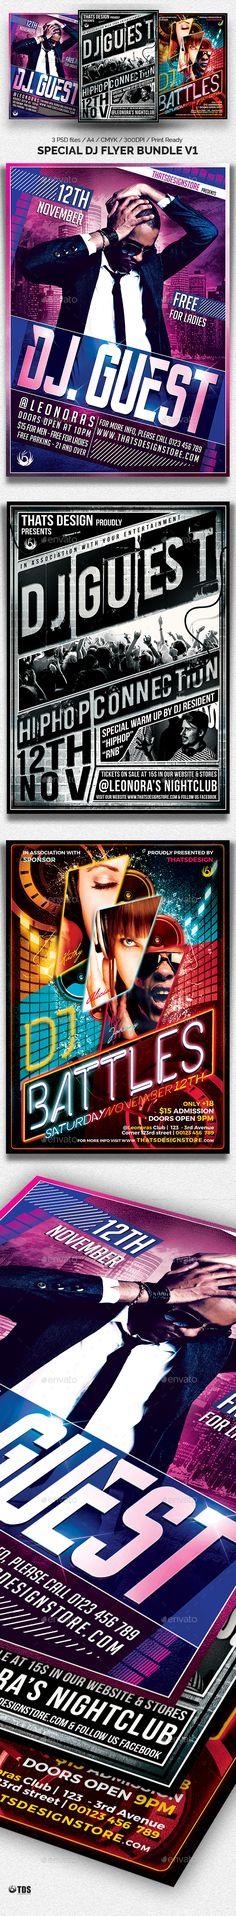 Special DJ Flyer Bundle V1 - Clubs & Parties Events